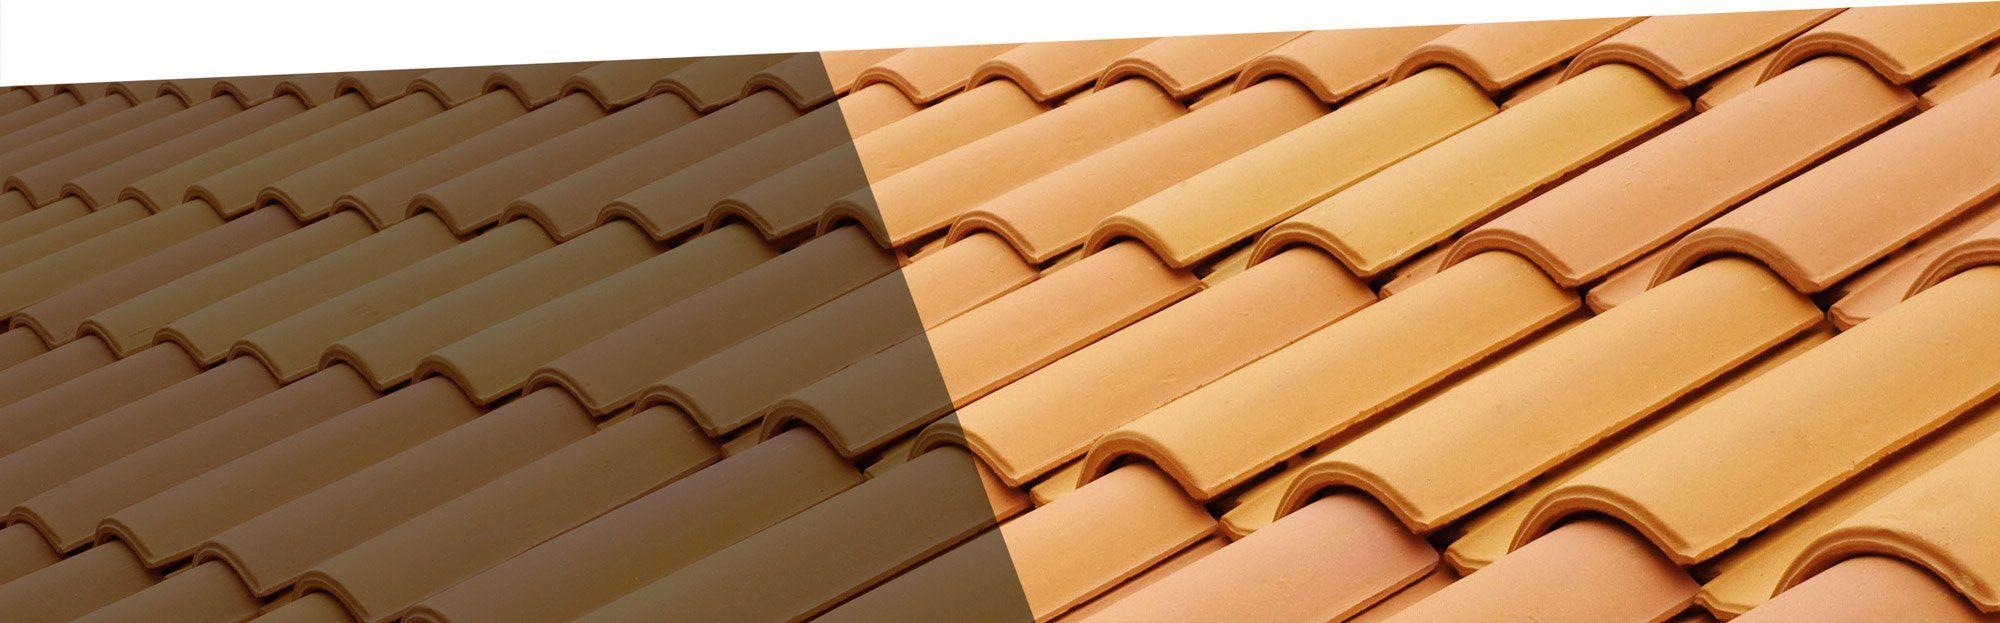 Roof Repair Mesa Phoenix Residential Amp Commercial